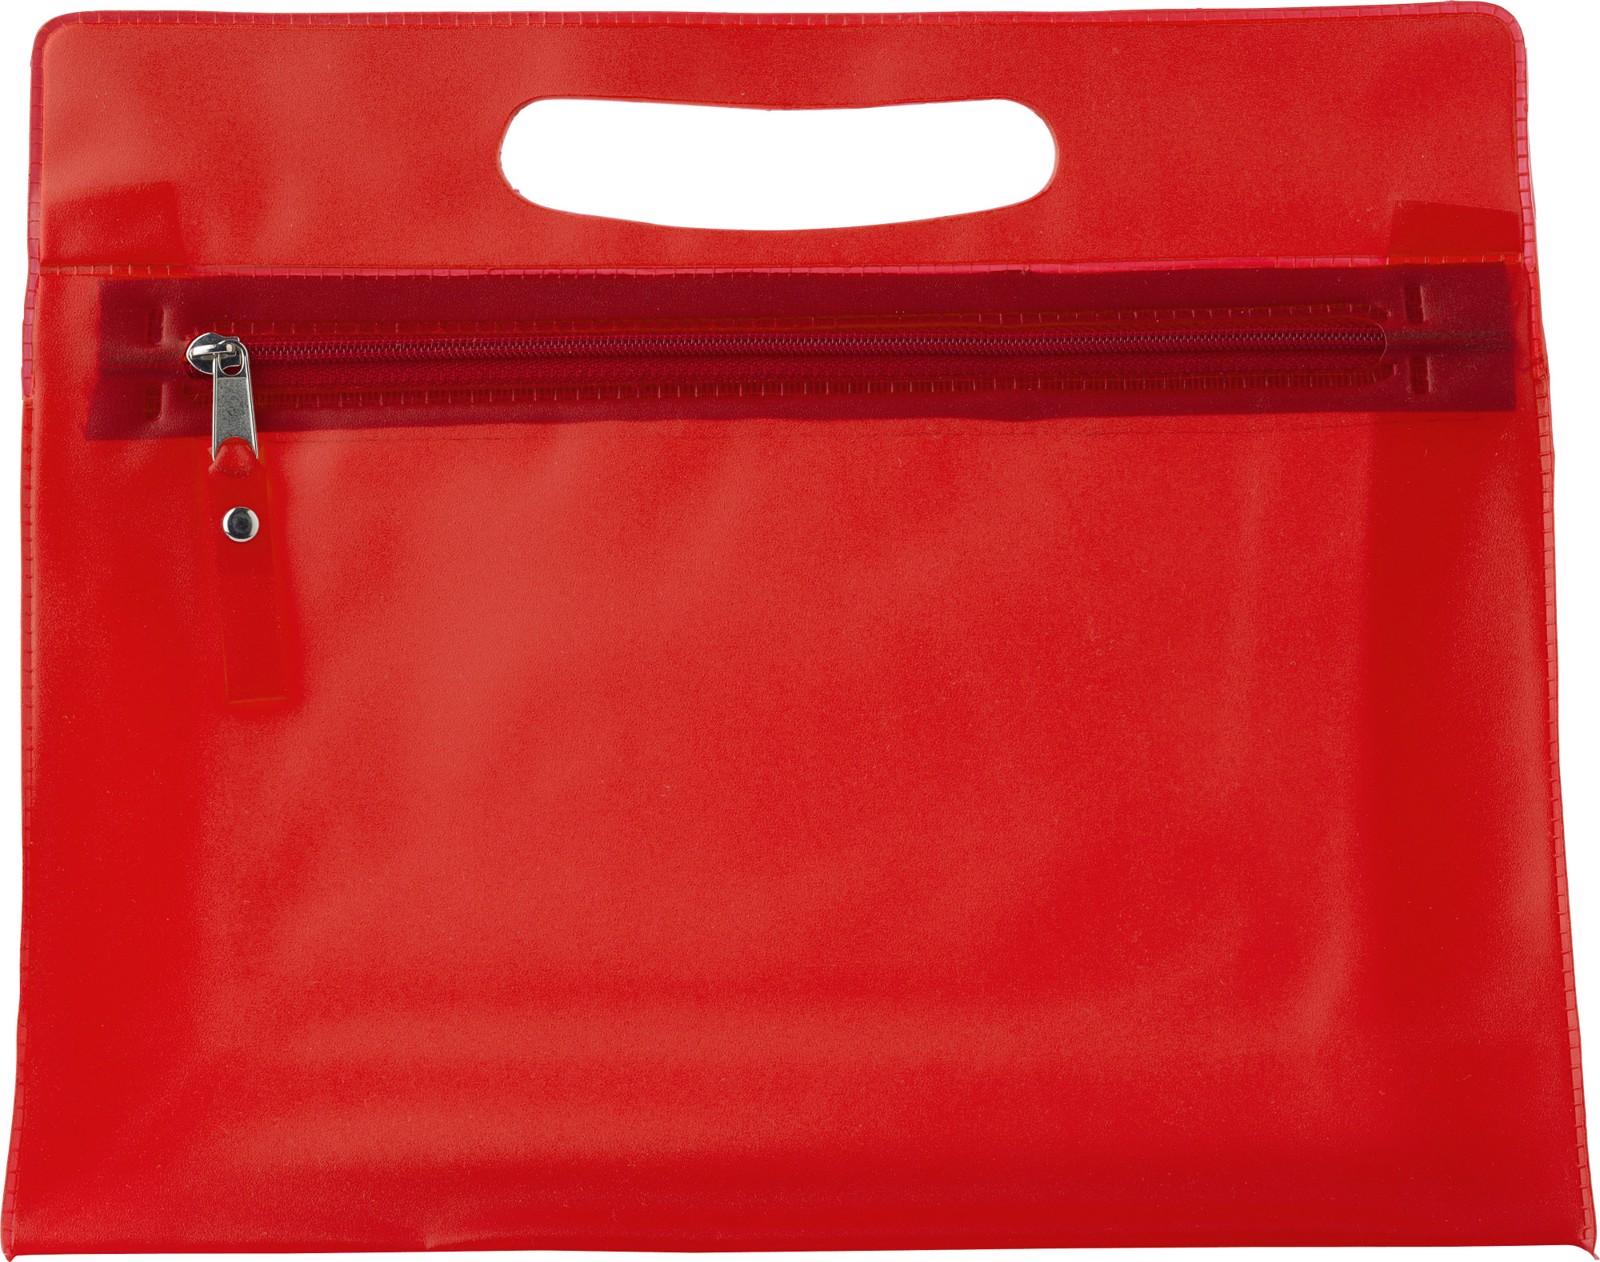 PVC  toilet bag - Red